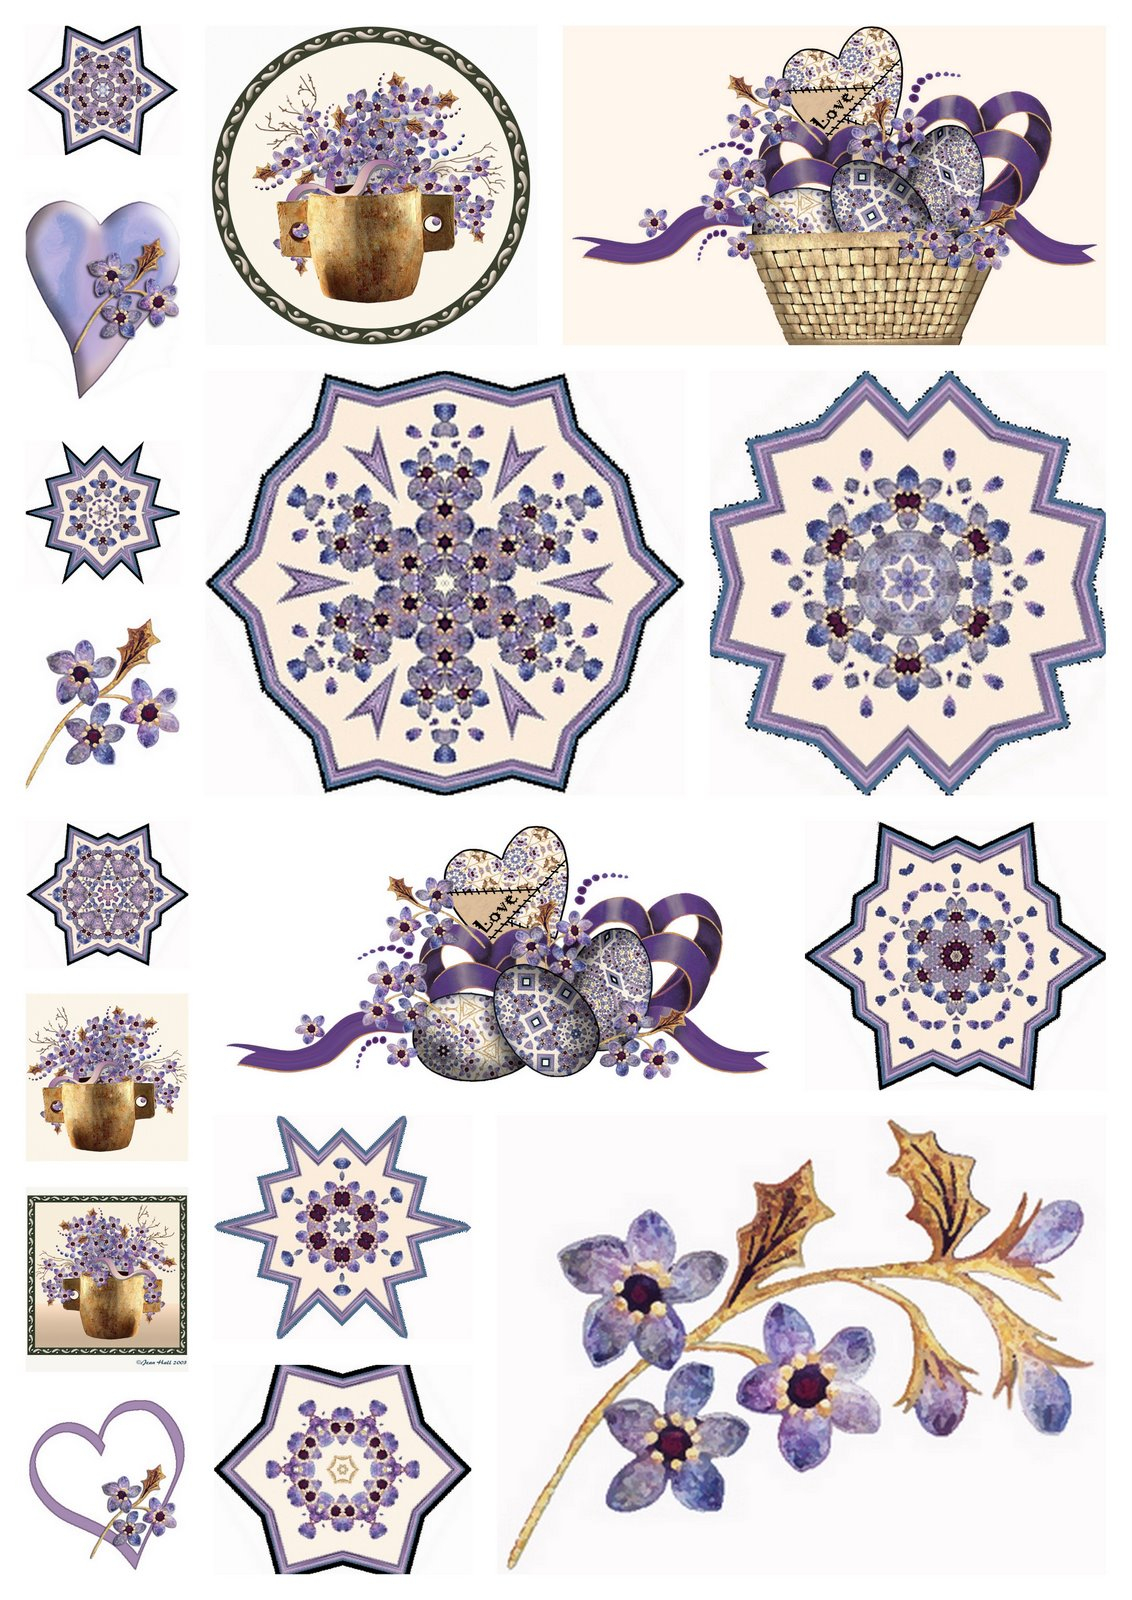 Artbyjean - Purple Wood Roses: Scrapbook Embellishments - Free Printable Scrapbook Decorations